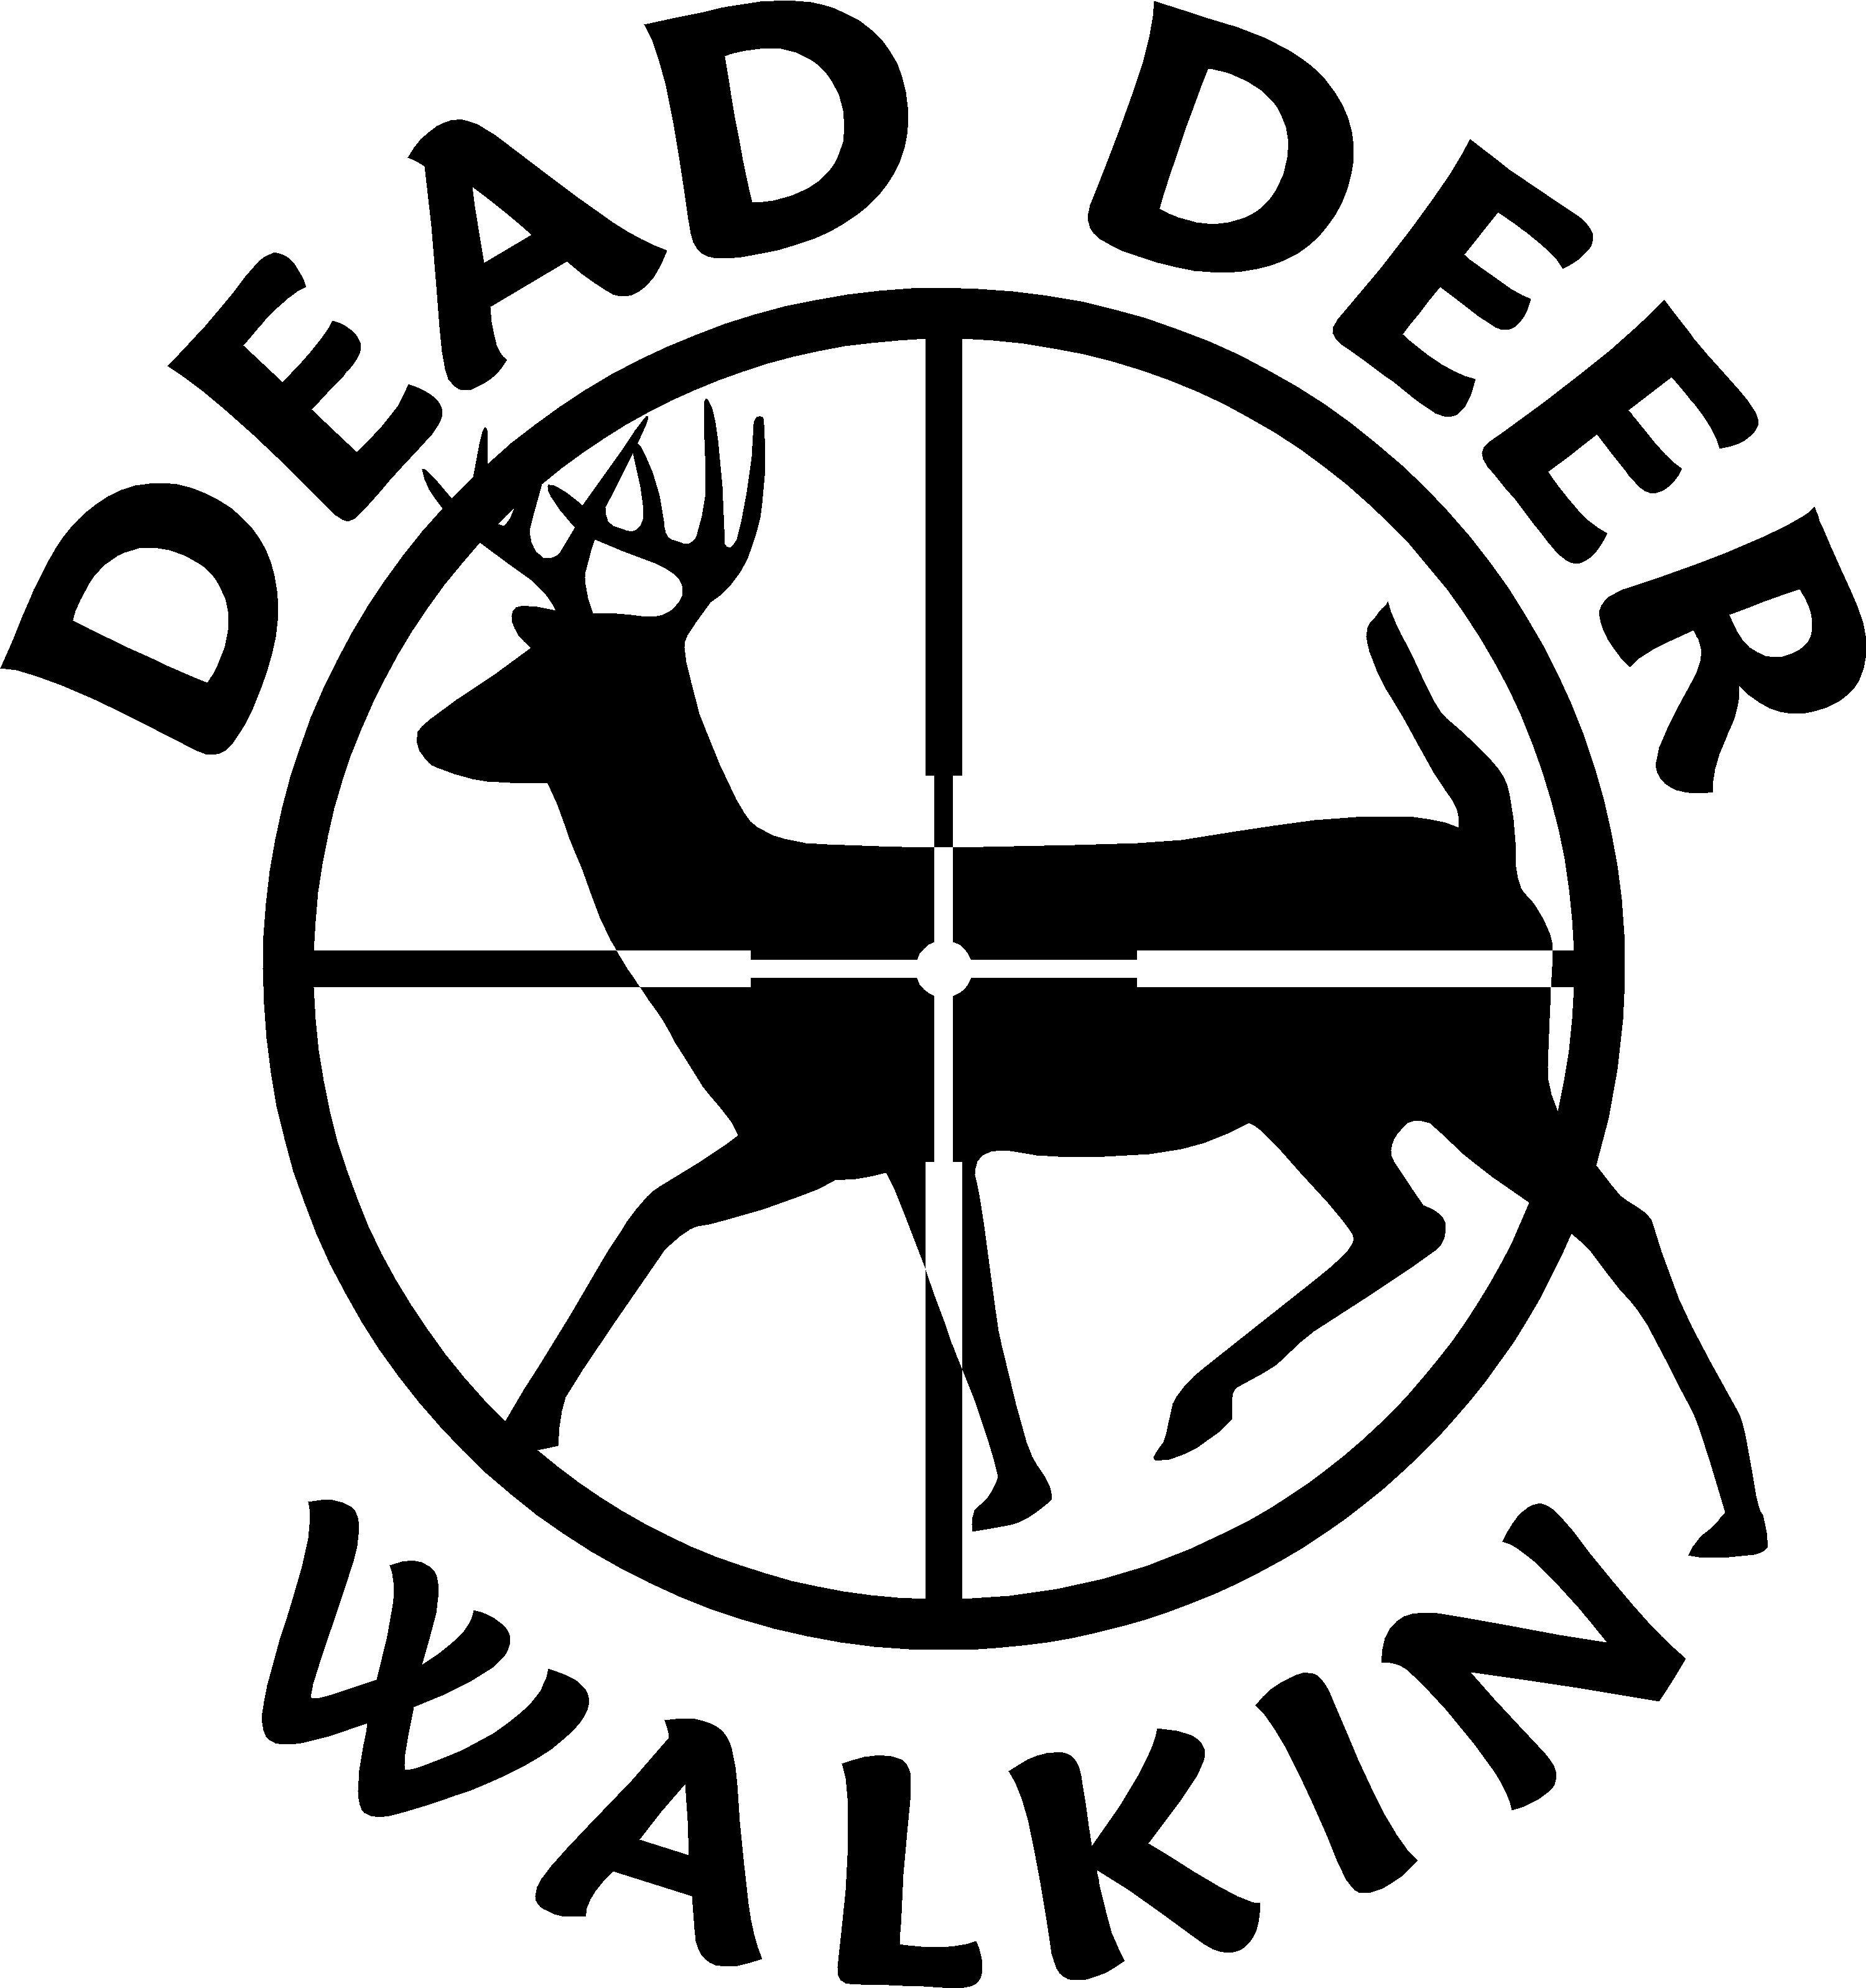 Deer Hunting Window Decals And Window Stickers